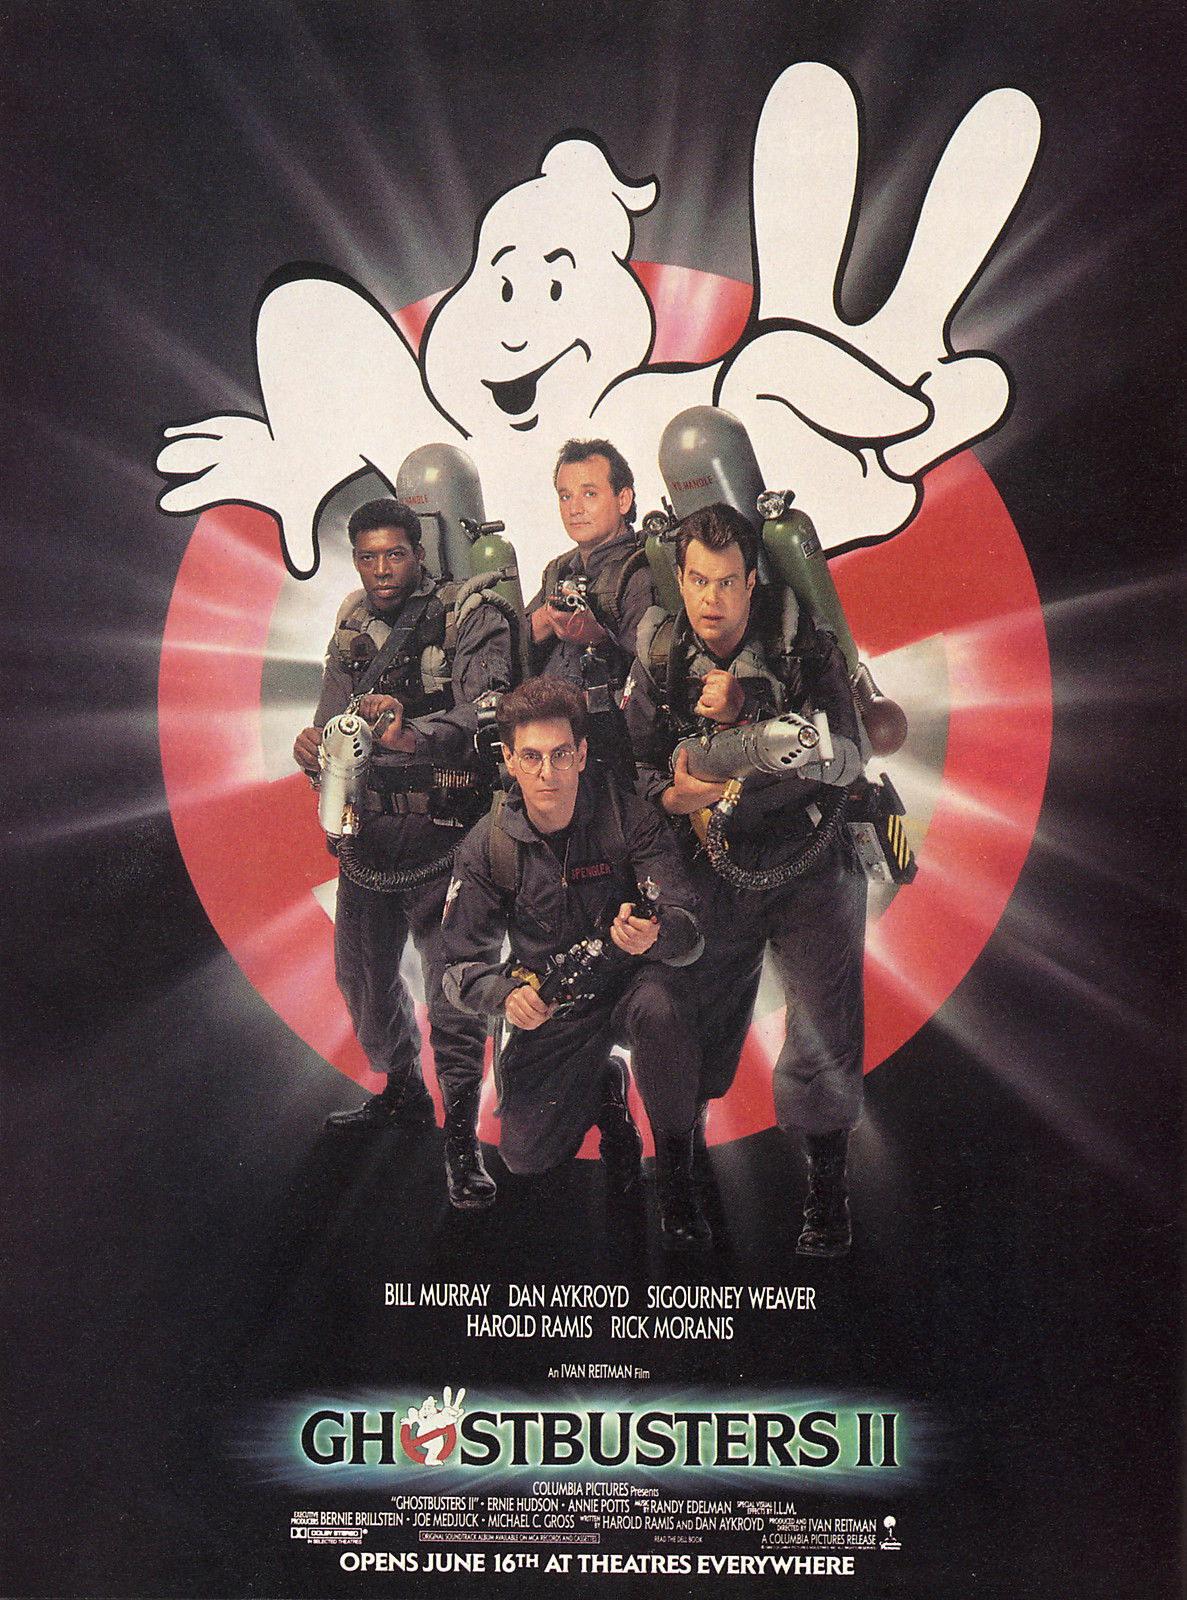 72715-GHOSTBUSTERS-II-Movie-Bill-Murray-Dan-Akroyd-Wall-Print-Poster-Affiche